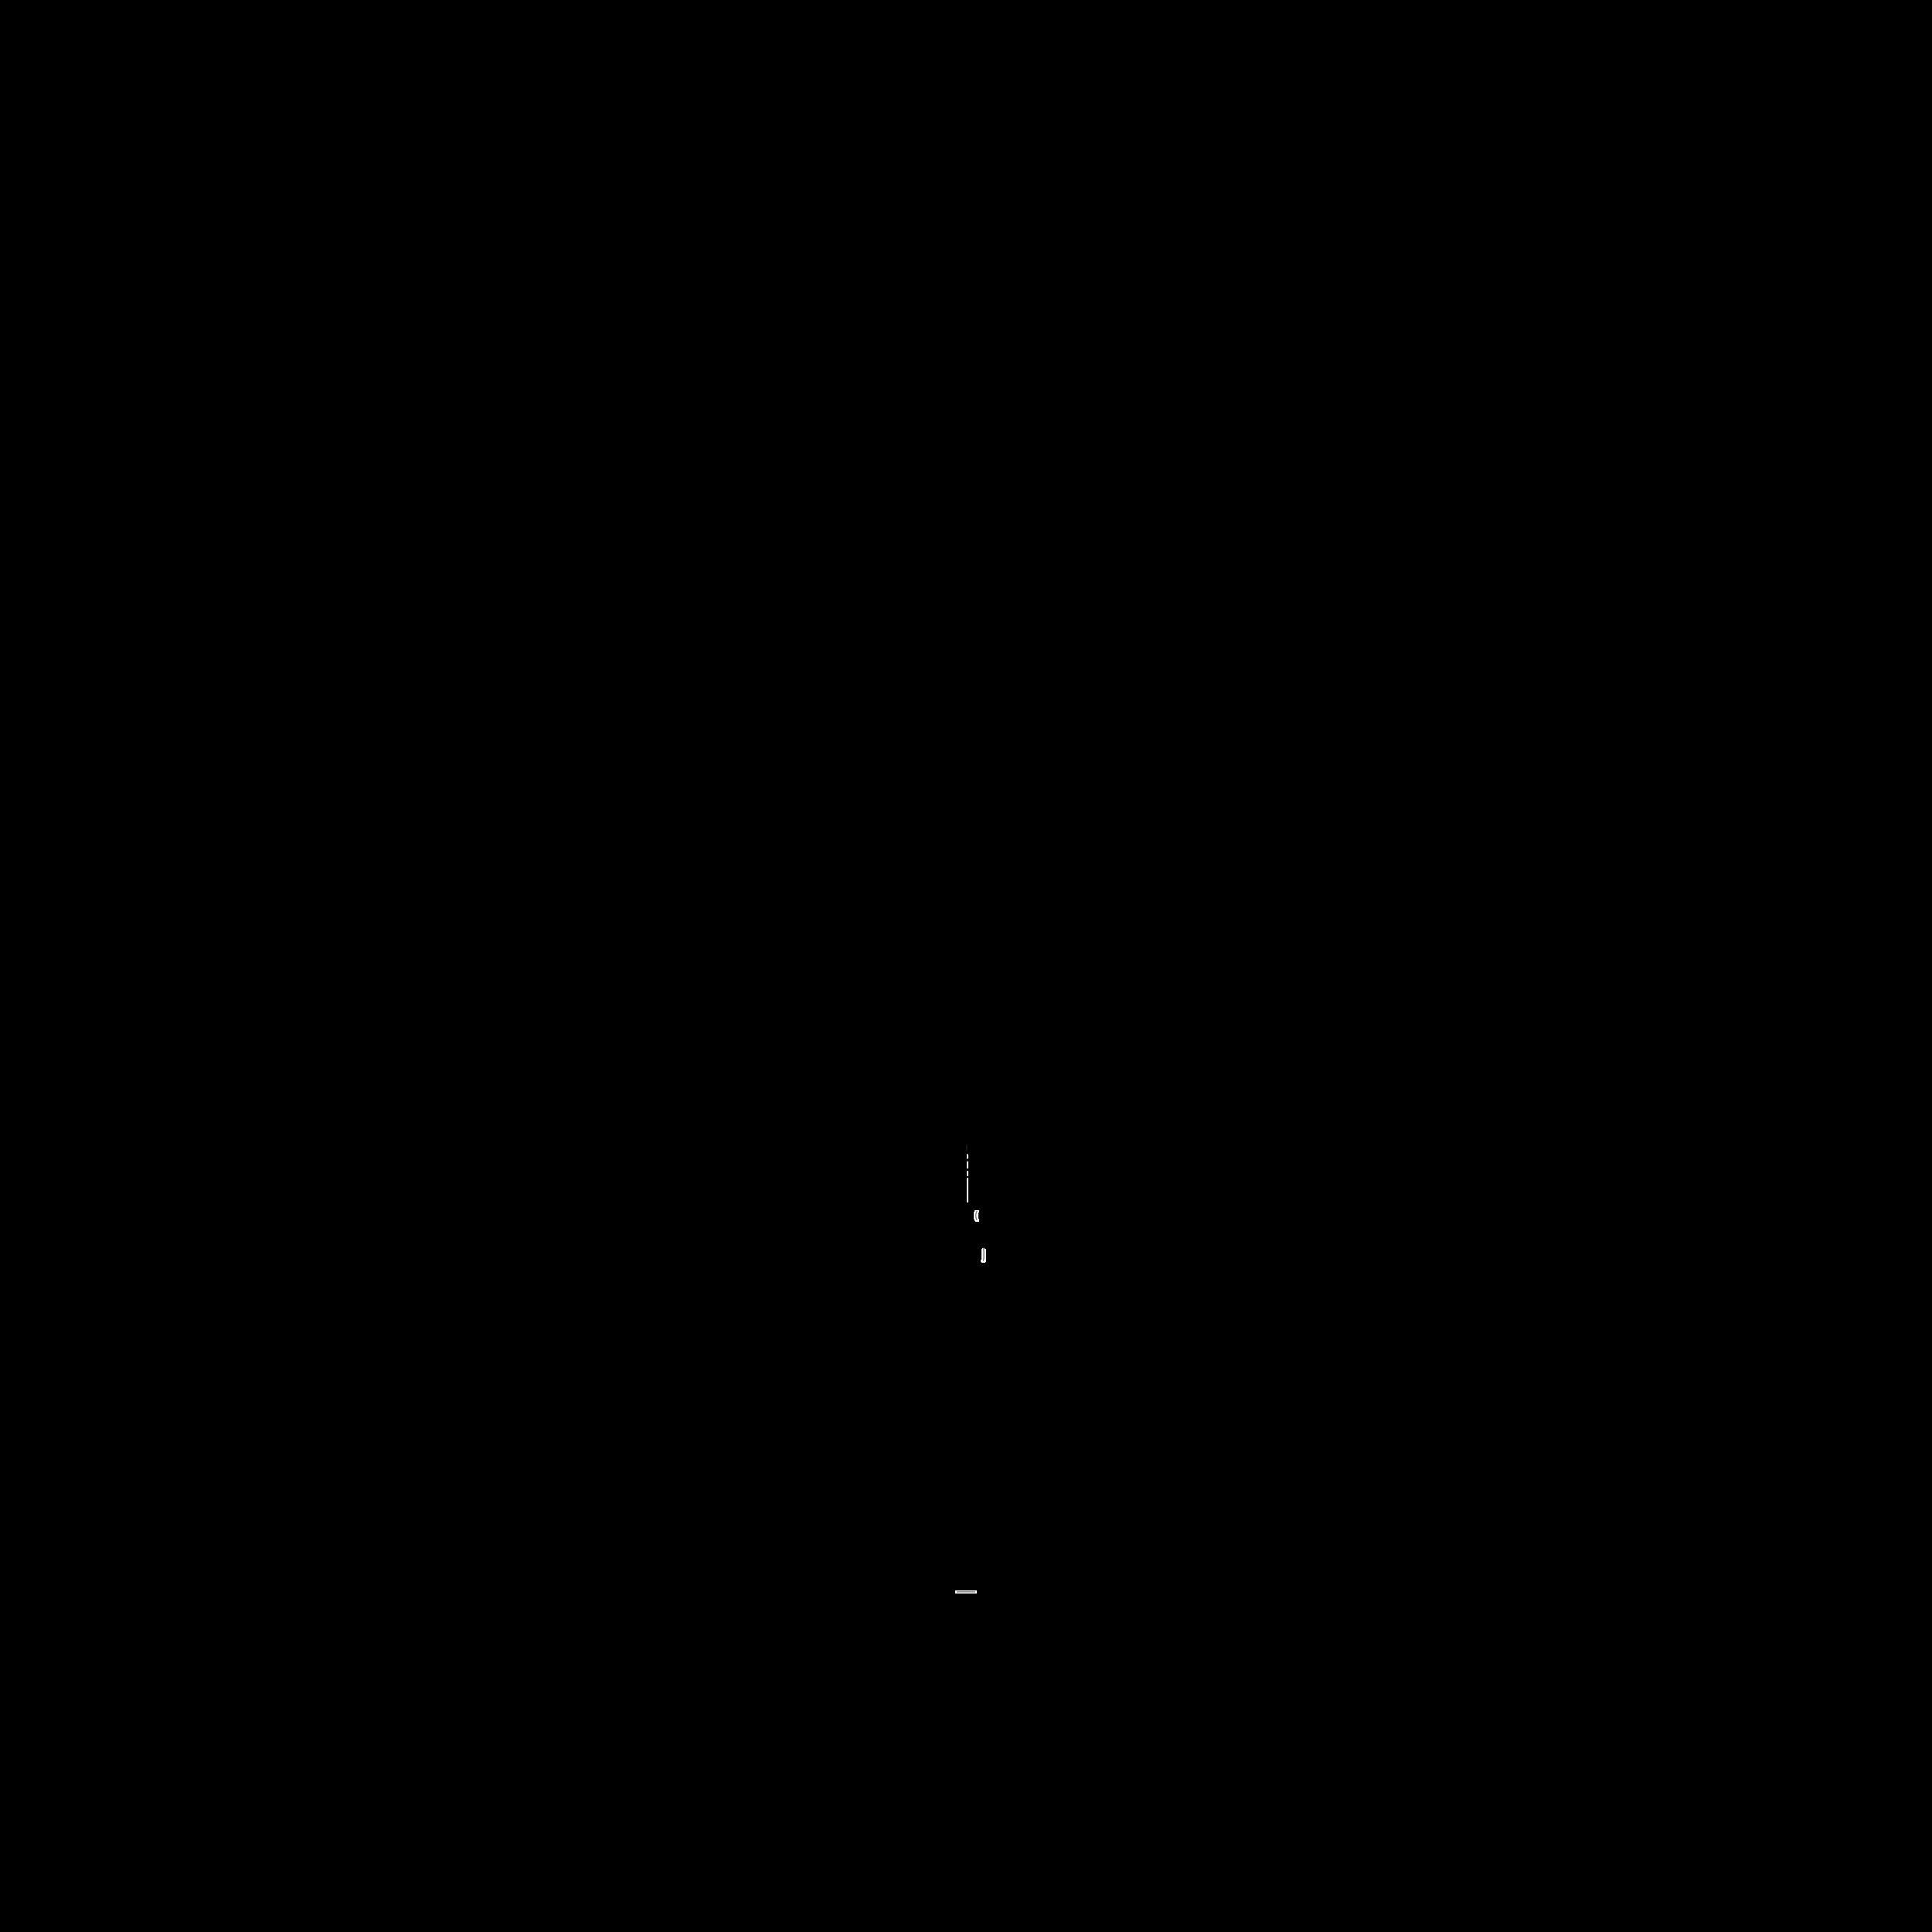 Panda Joy Orthographic-01.png